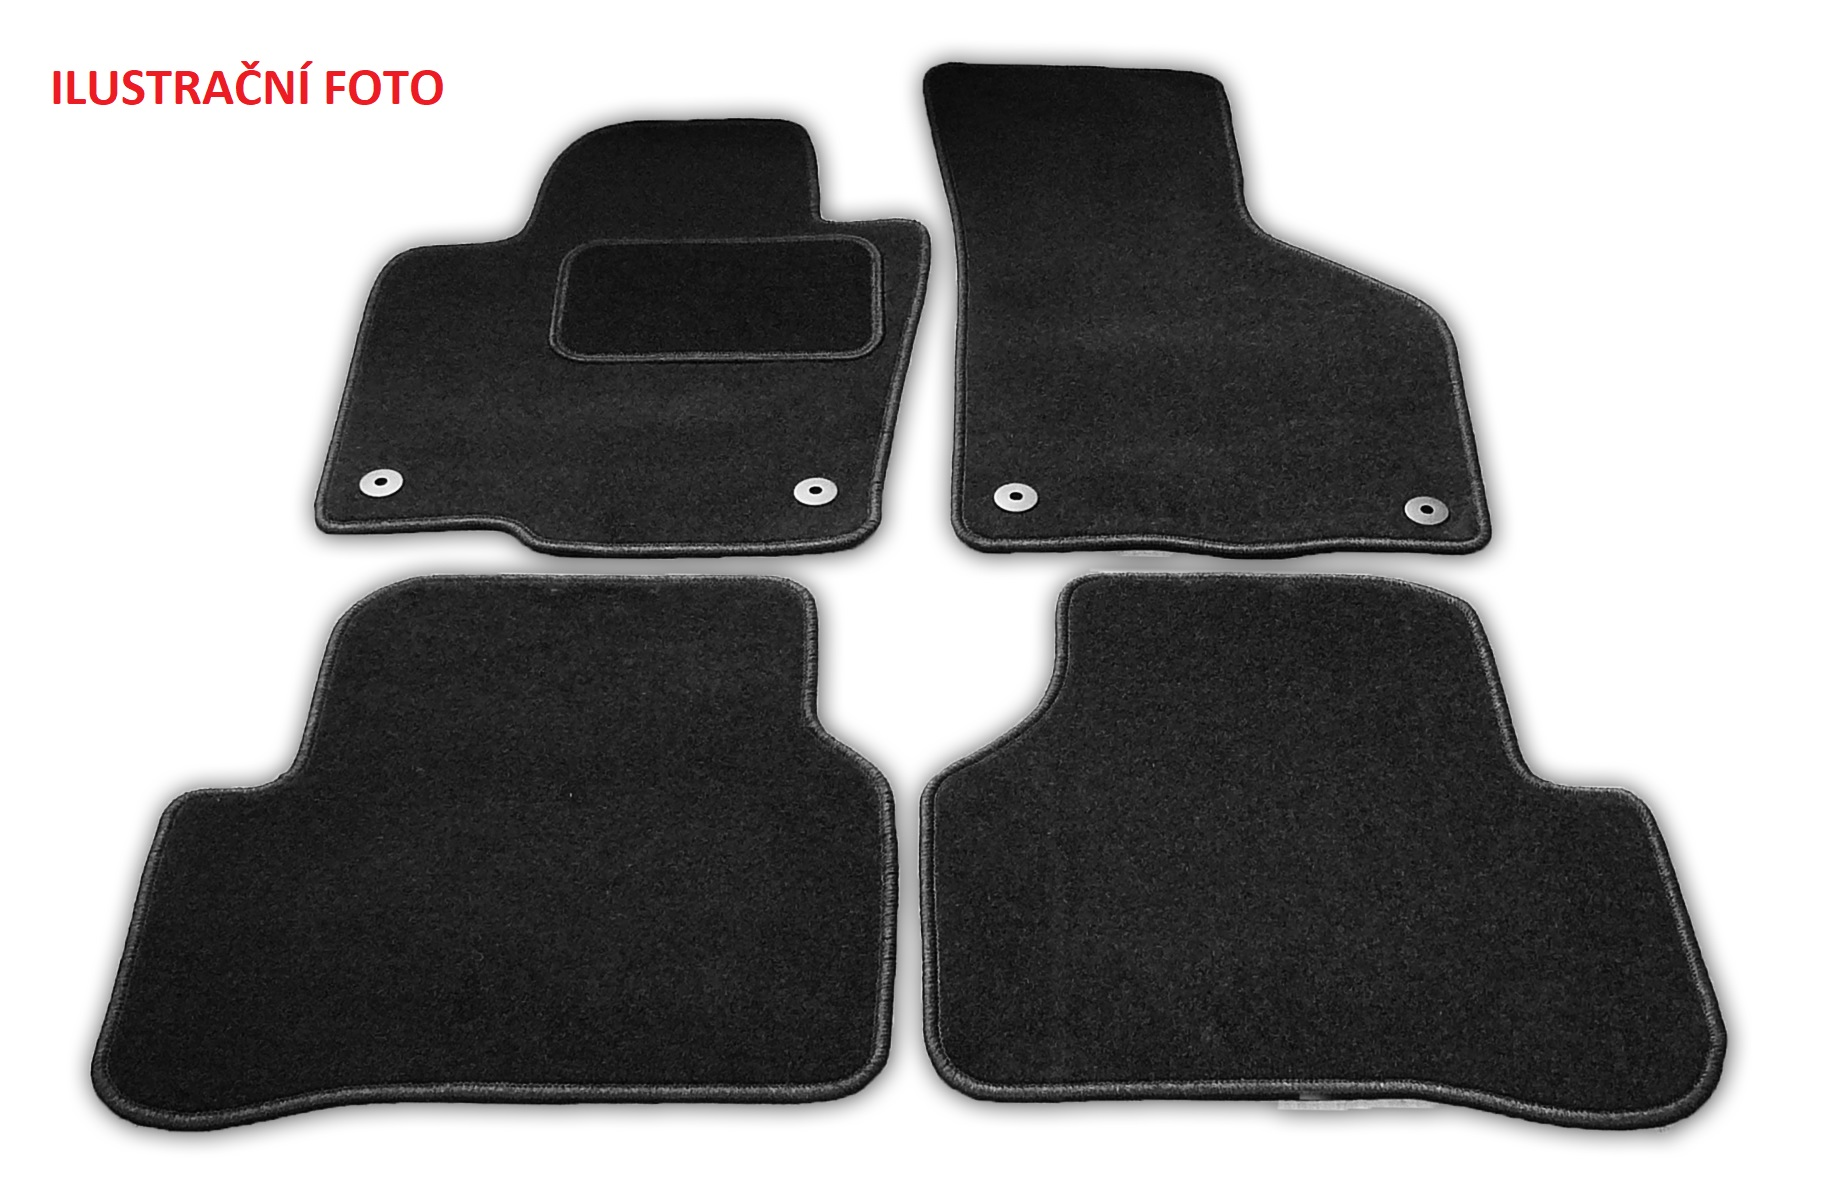 Automega Textilní autokoberce Standard Renault Clio IV 2012-